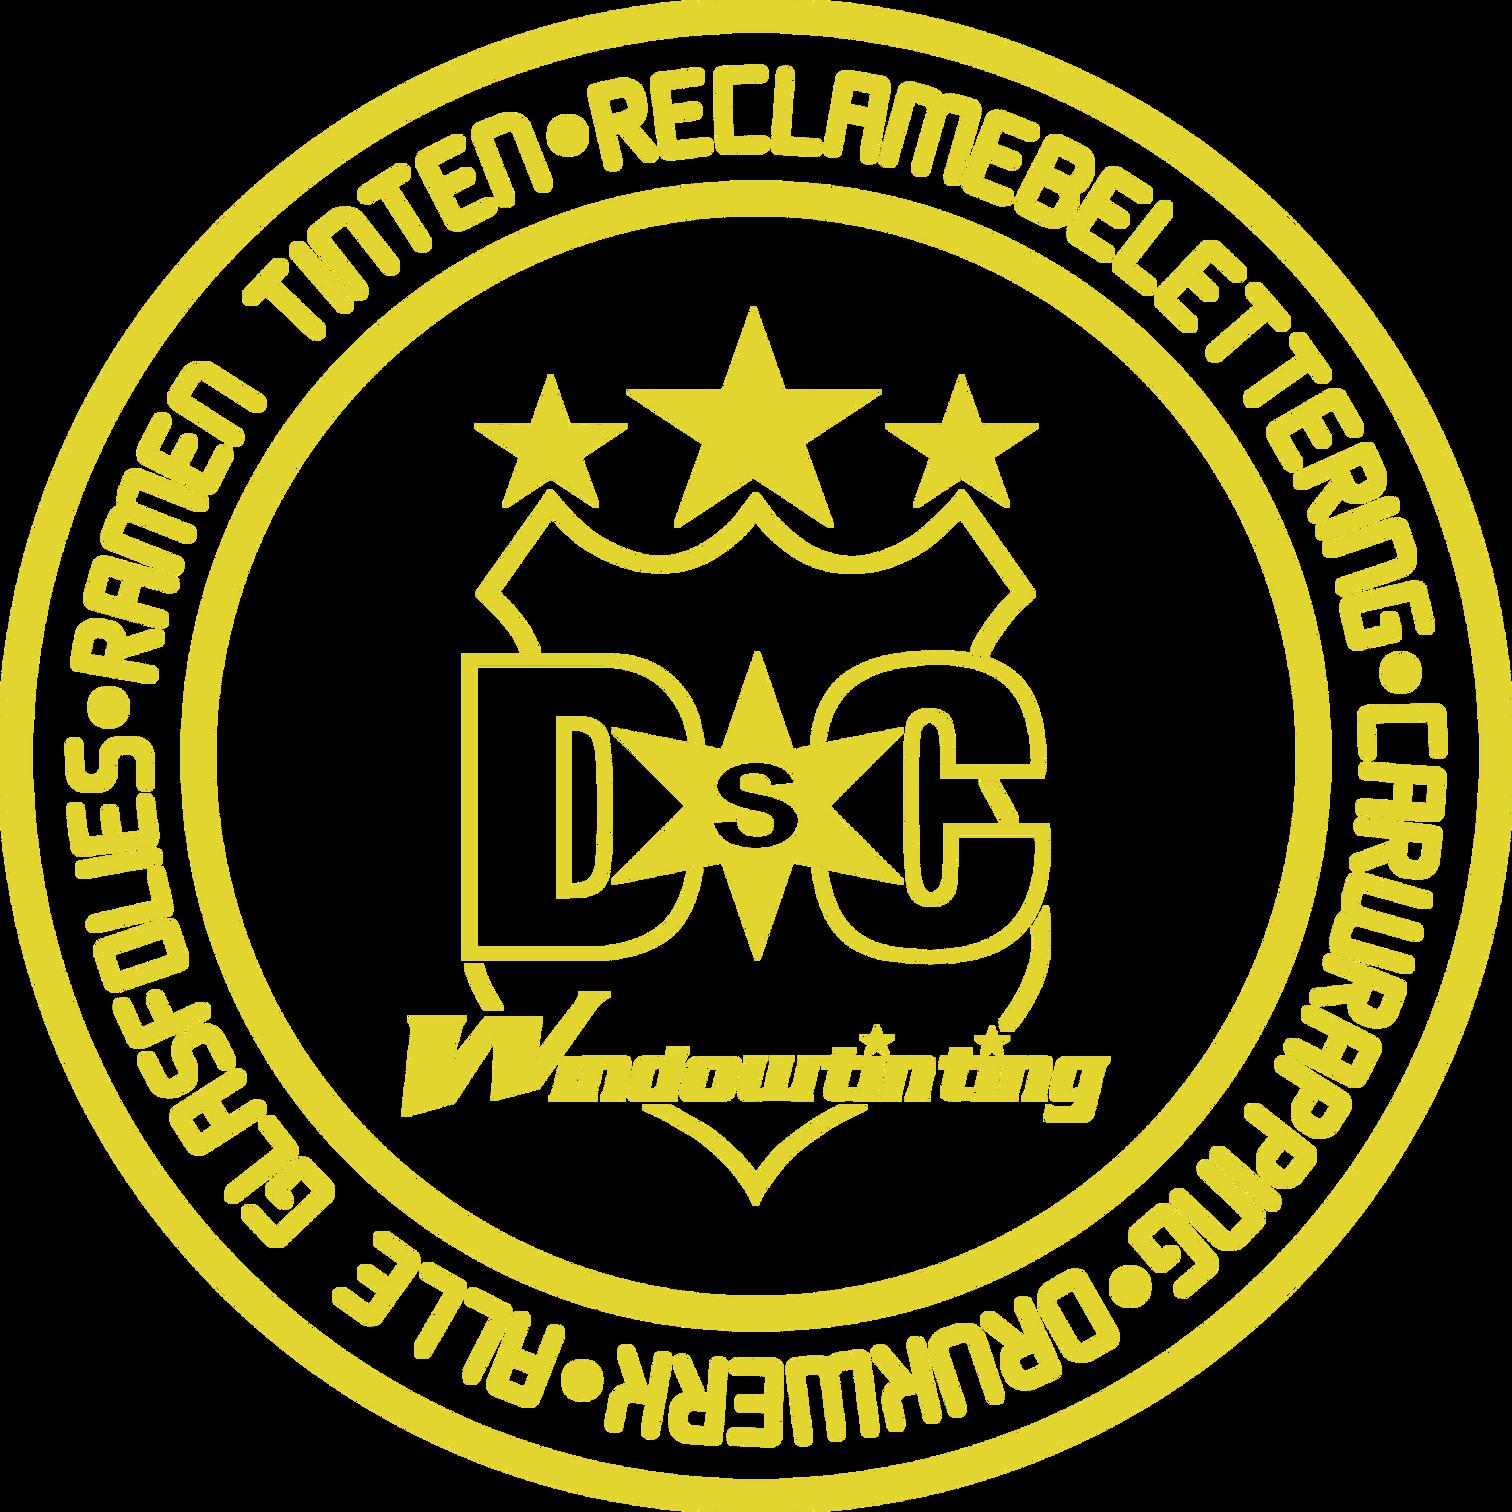 DSC Windowtinting / crealetter logo